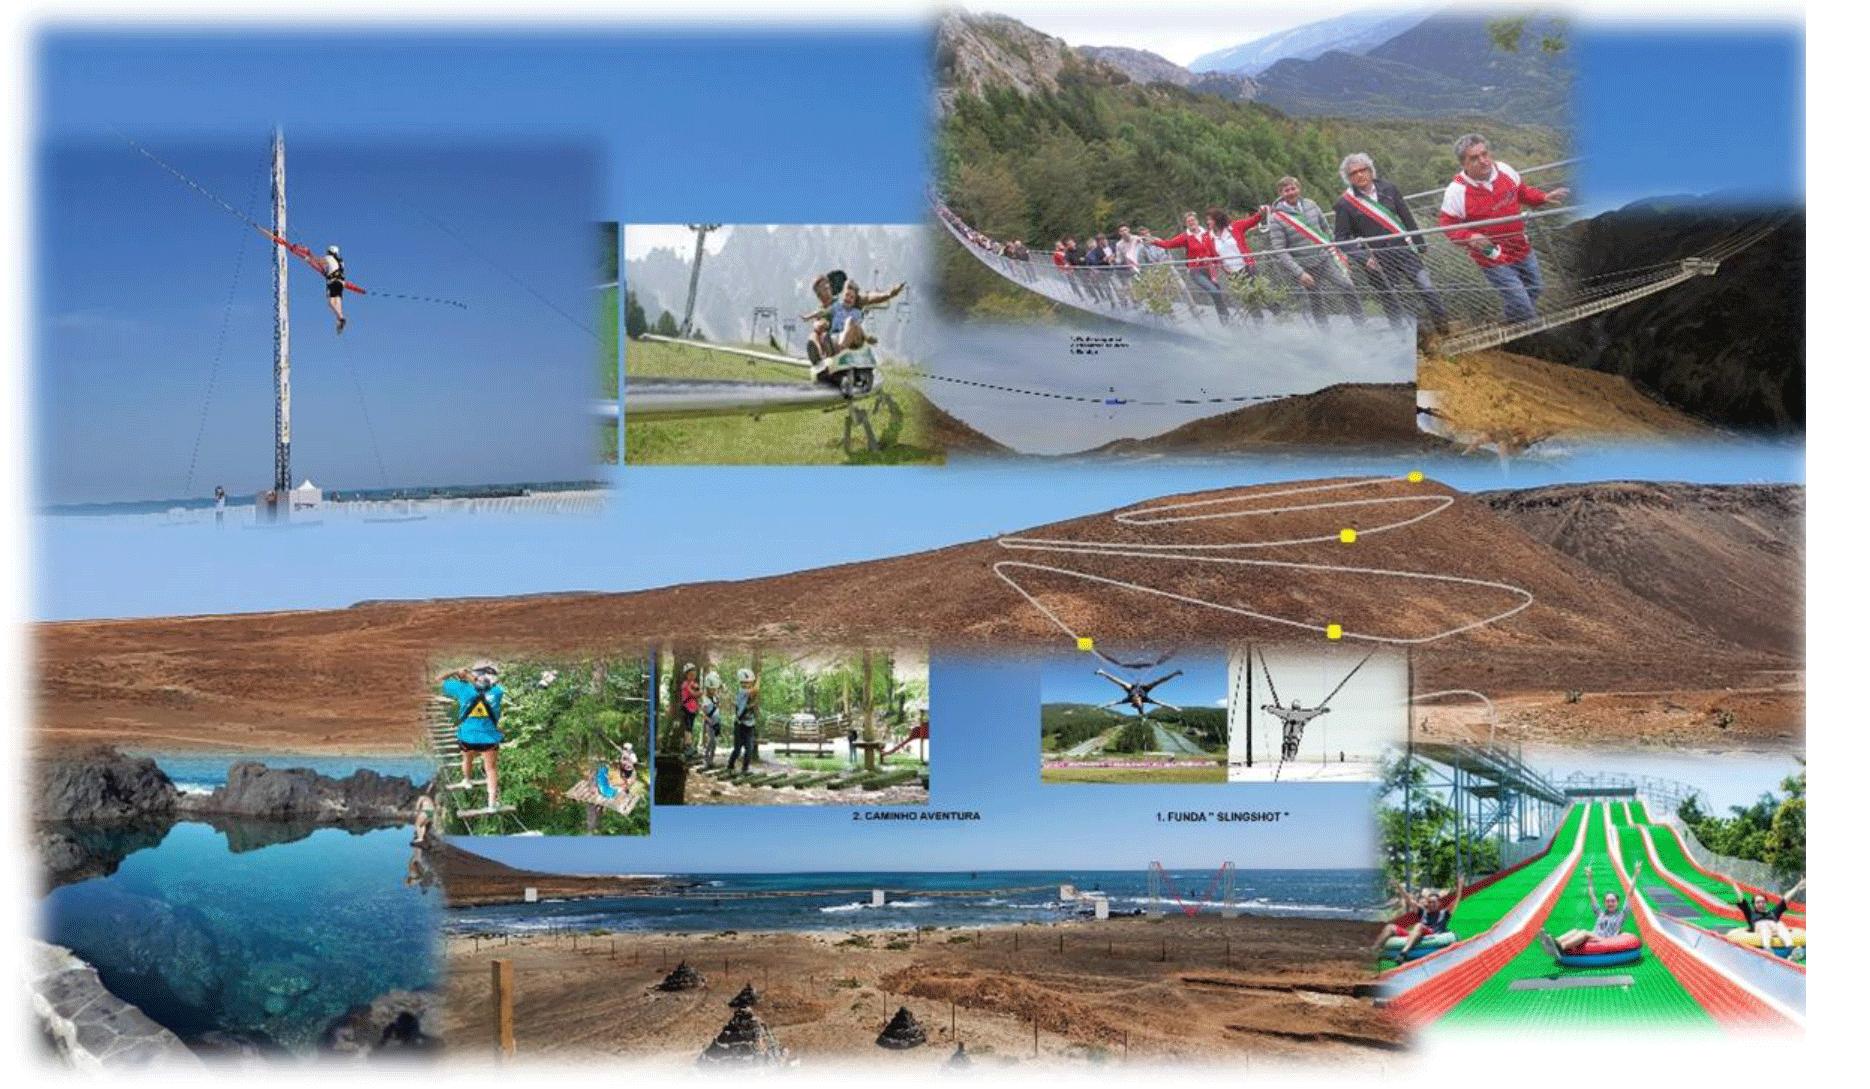 Estudo de Impacte Ambiental - Zipline Recreativo Fase II